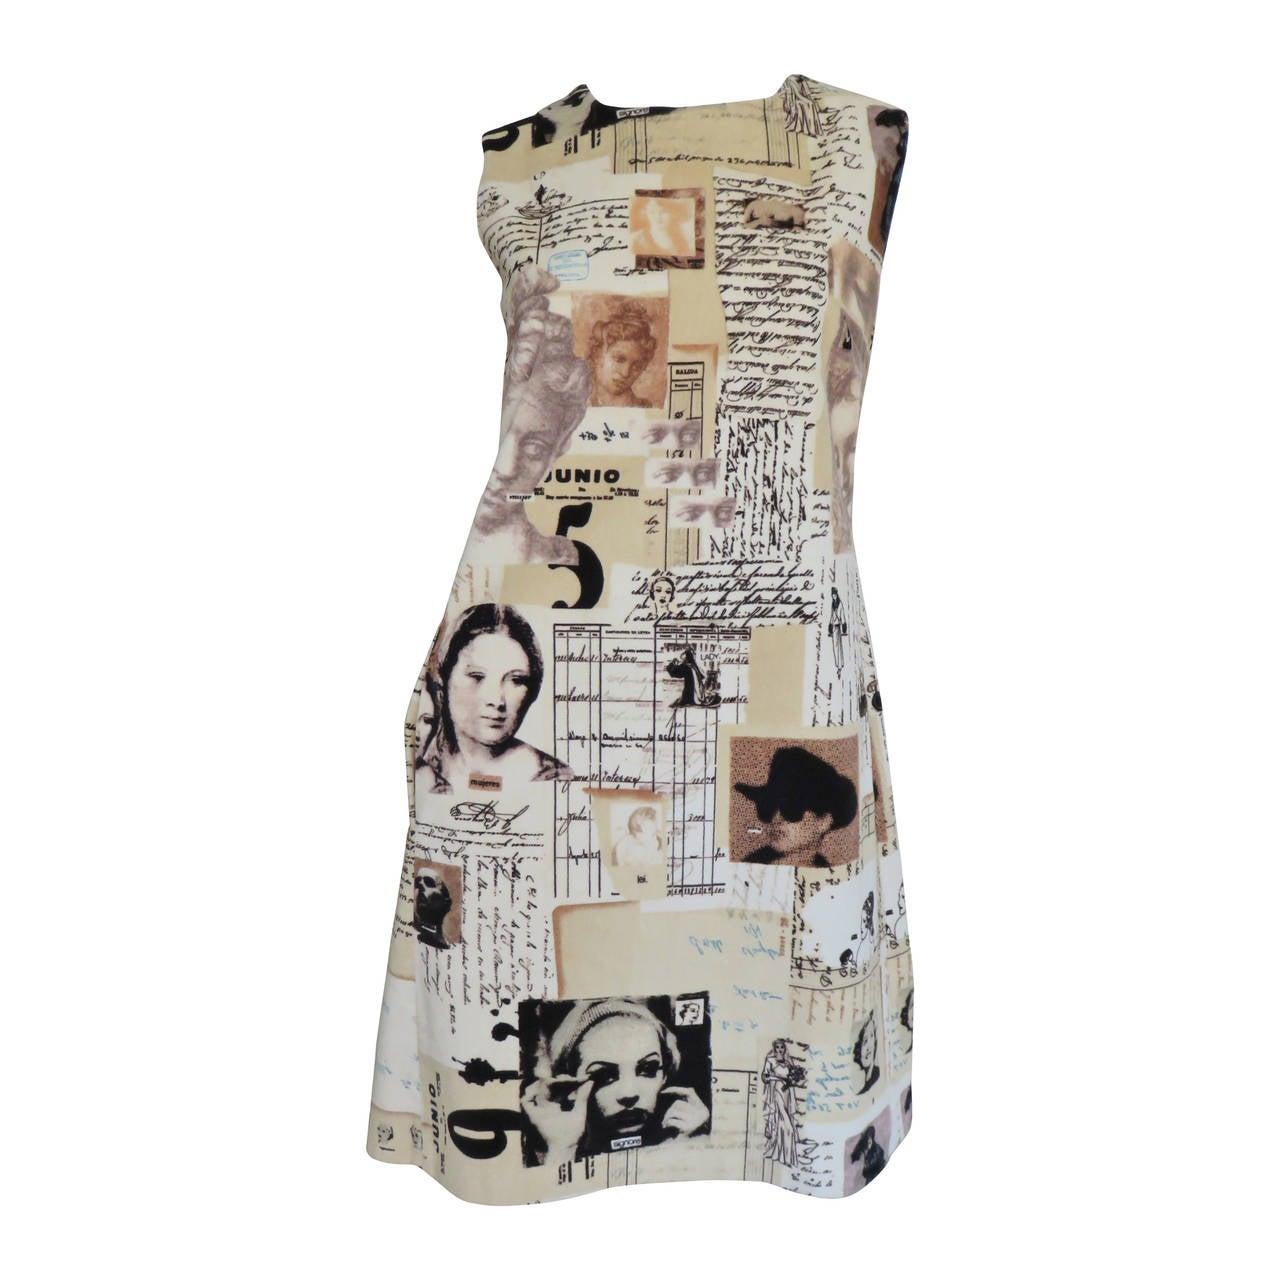 Moschino Photo Screen Print Dress 1